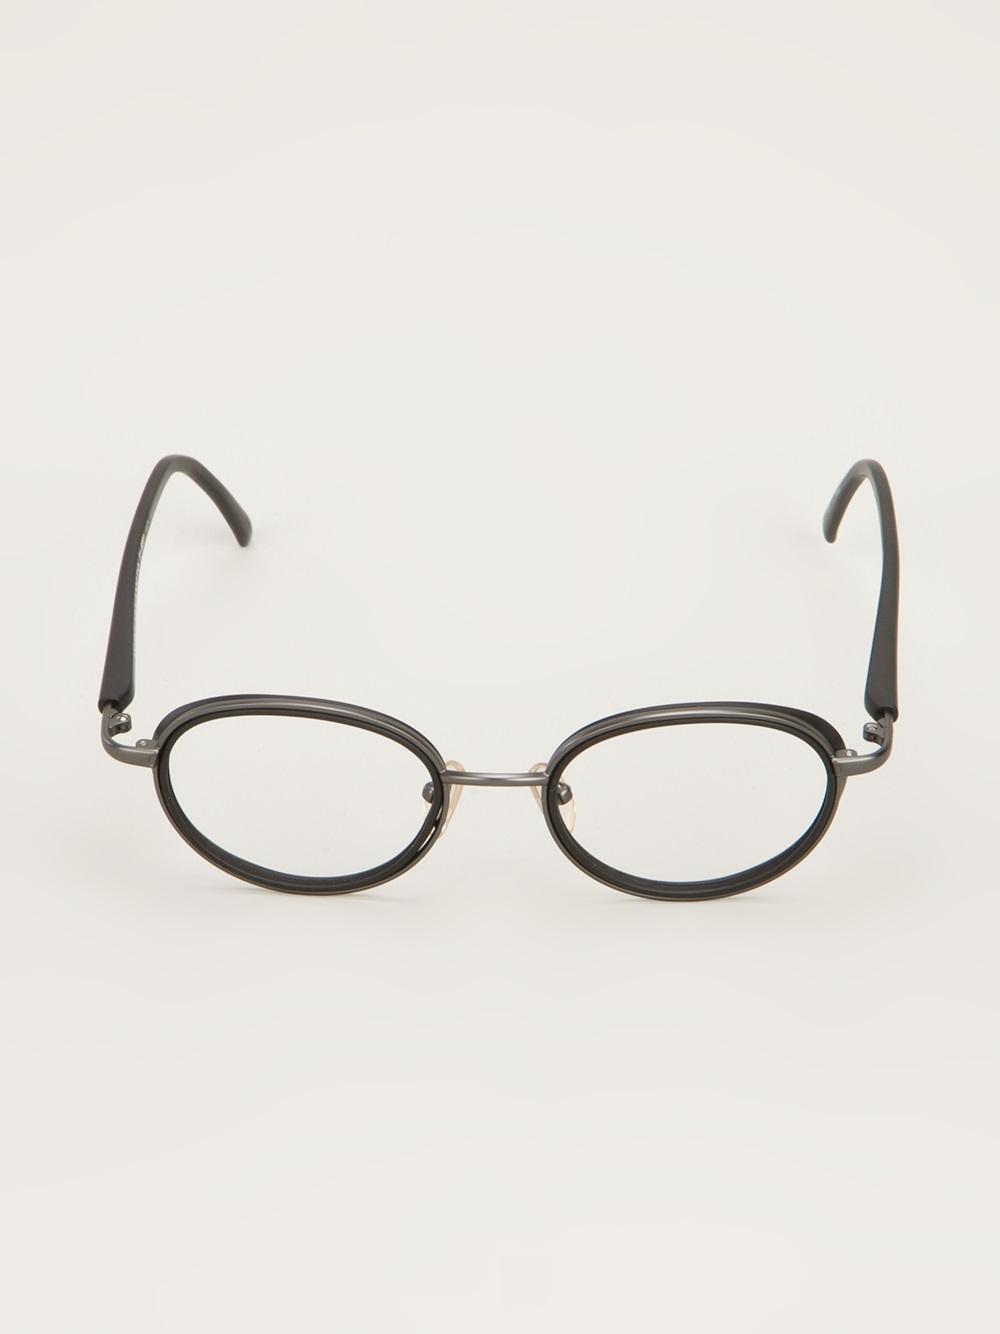 Black Frame Glasses Ragnarok : Yohji yamamoto Oval Frame Glasses in Black for Men Lyst